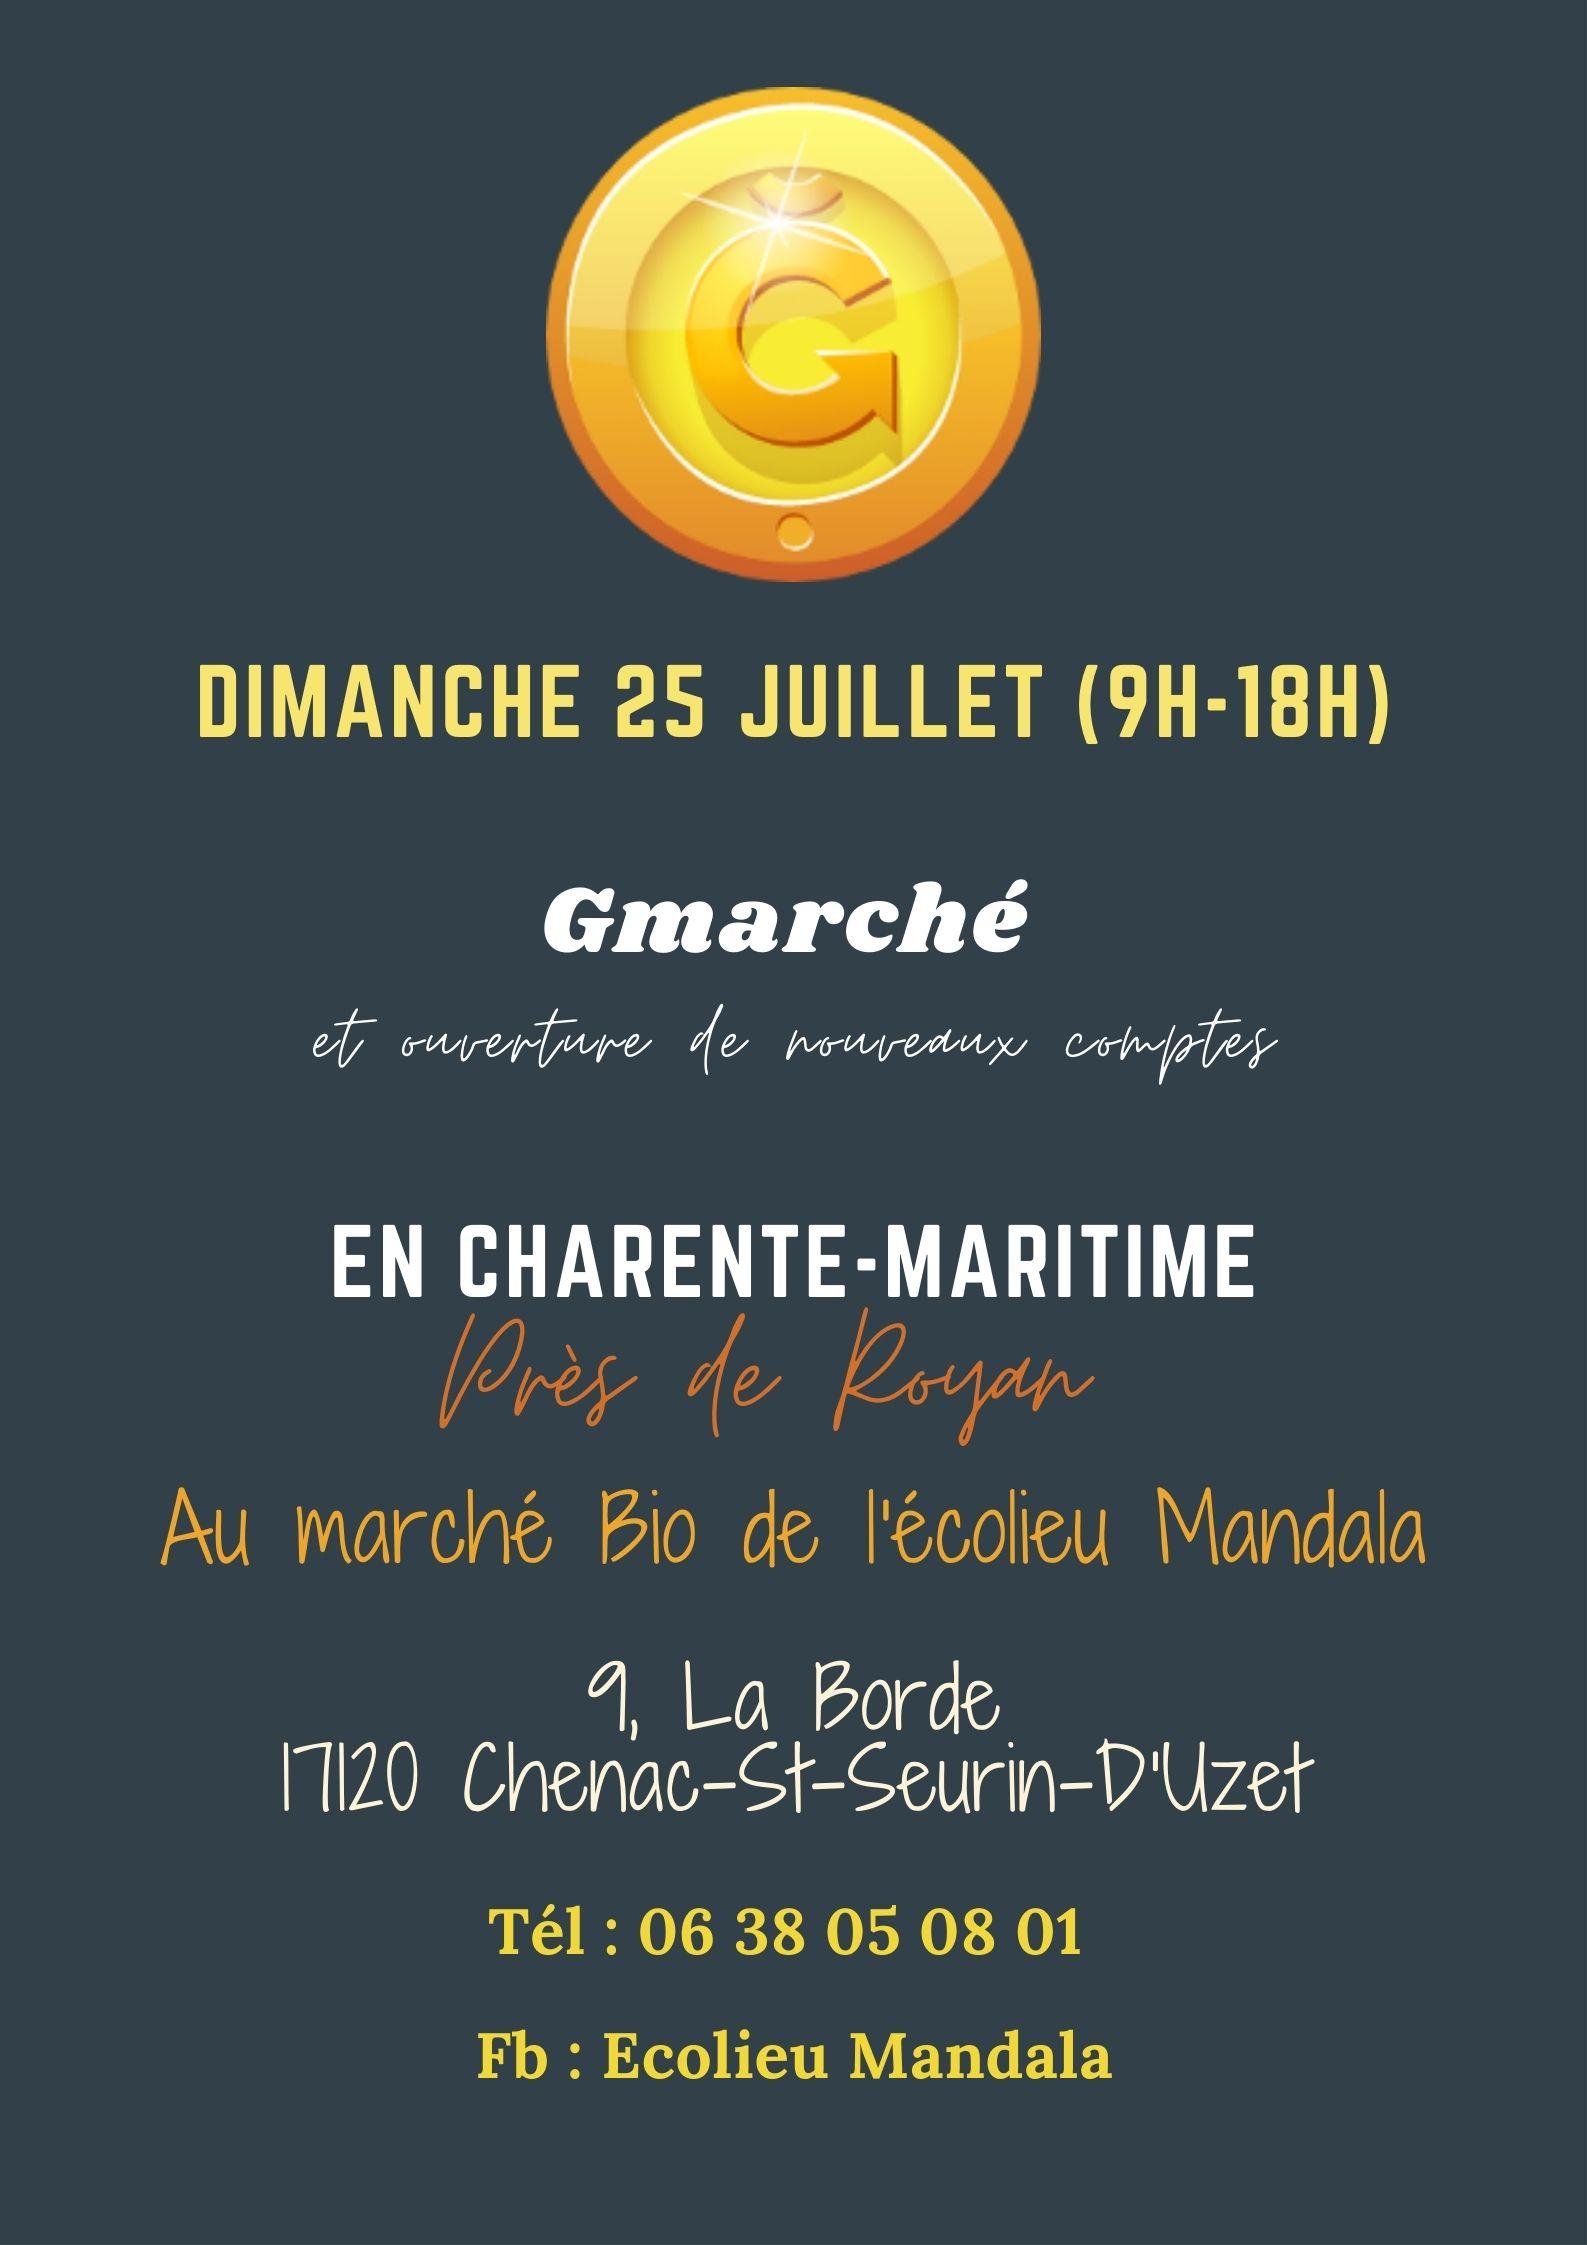 dimanche 27 juin stand g1 charente-maritime